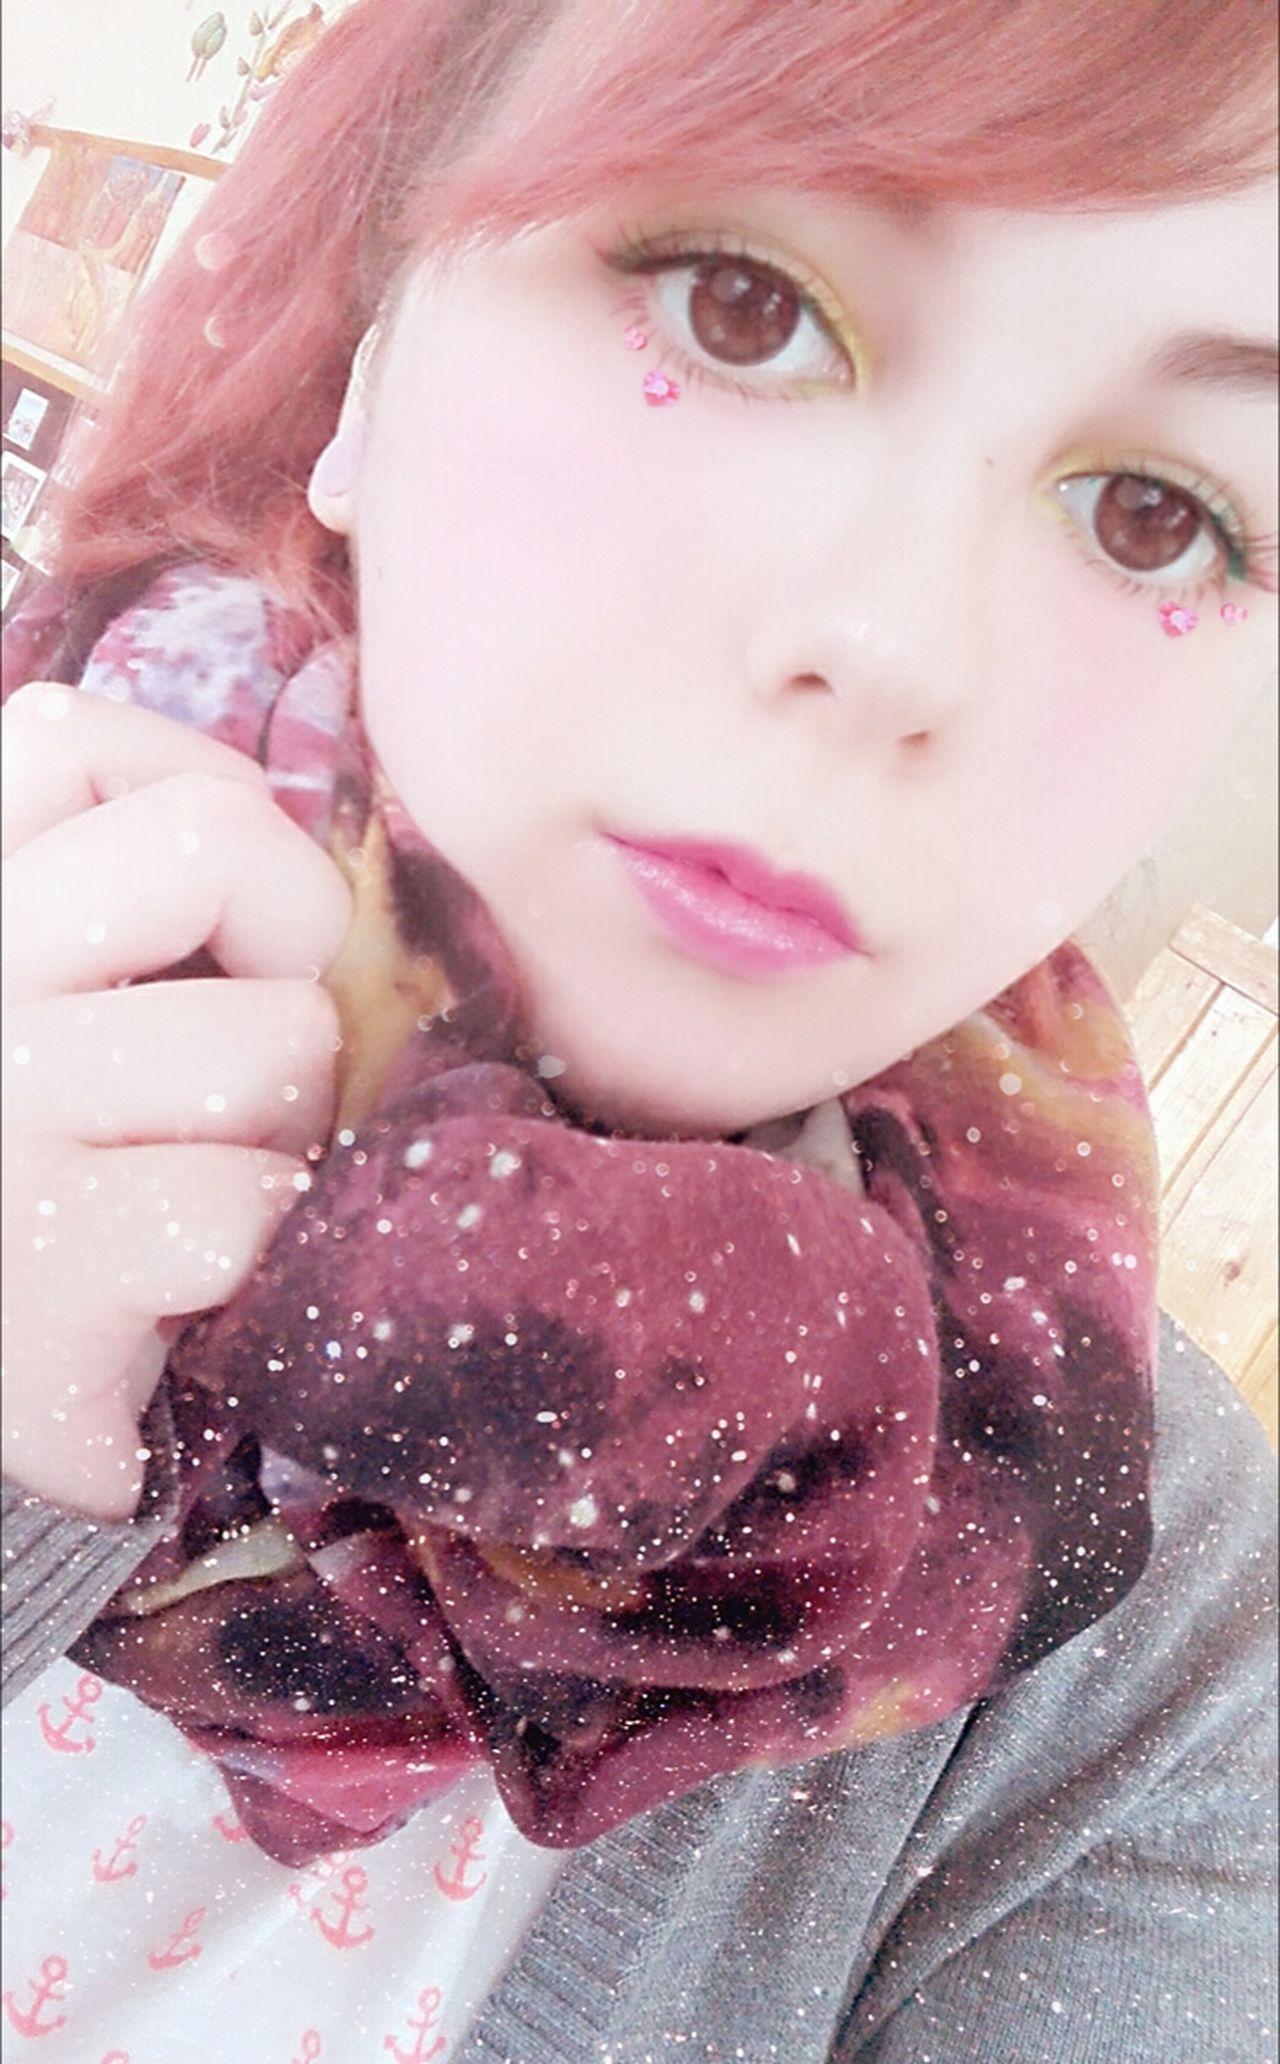 :D Workselfie School Its Me ThatsMe Selfie✌ Selfies Self Portrait Selfie Portrait Redhead Lipstick Alternativegirl Coloredhair Women Only Women Portrait Picoftheday Portraits Girl One Woman Only Lips Photooftheday Like4like Redhair Makeup Me